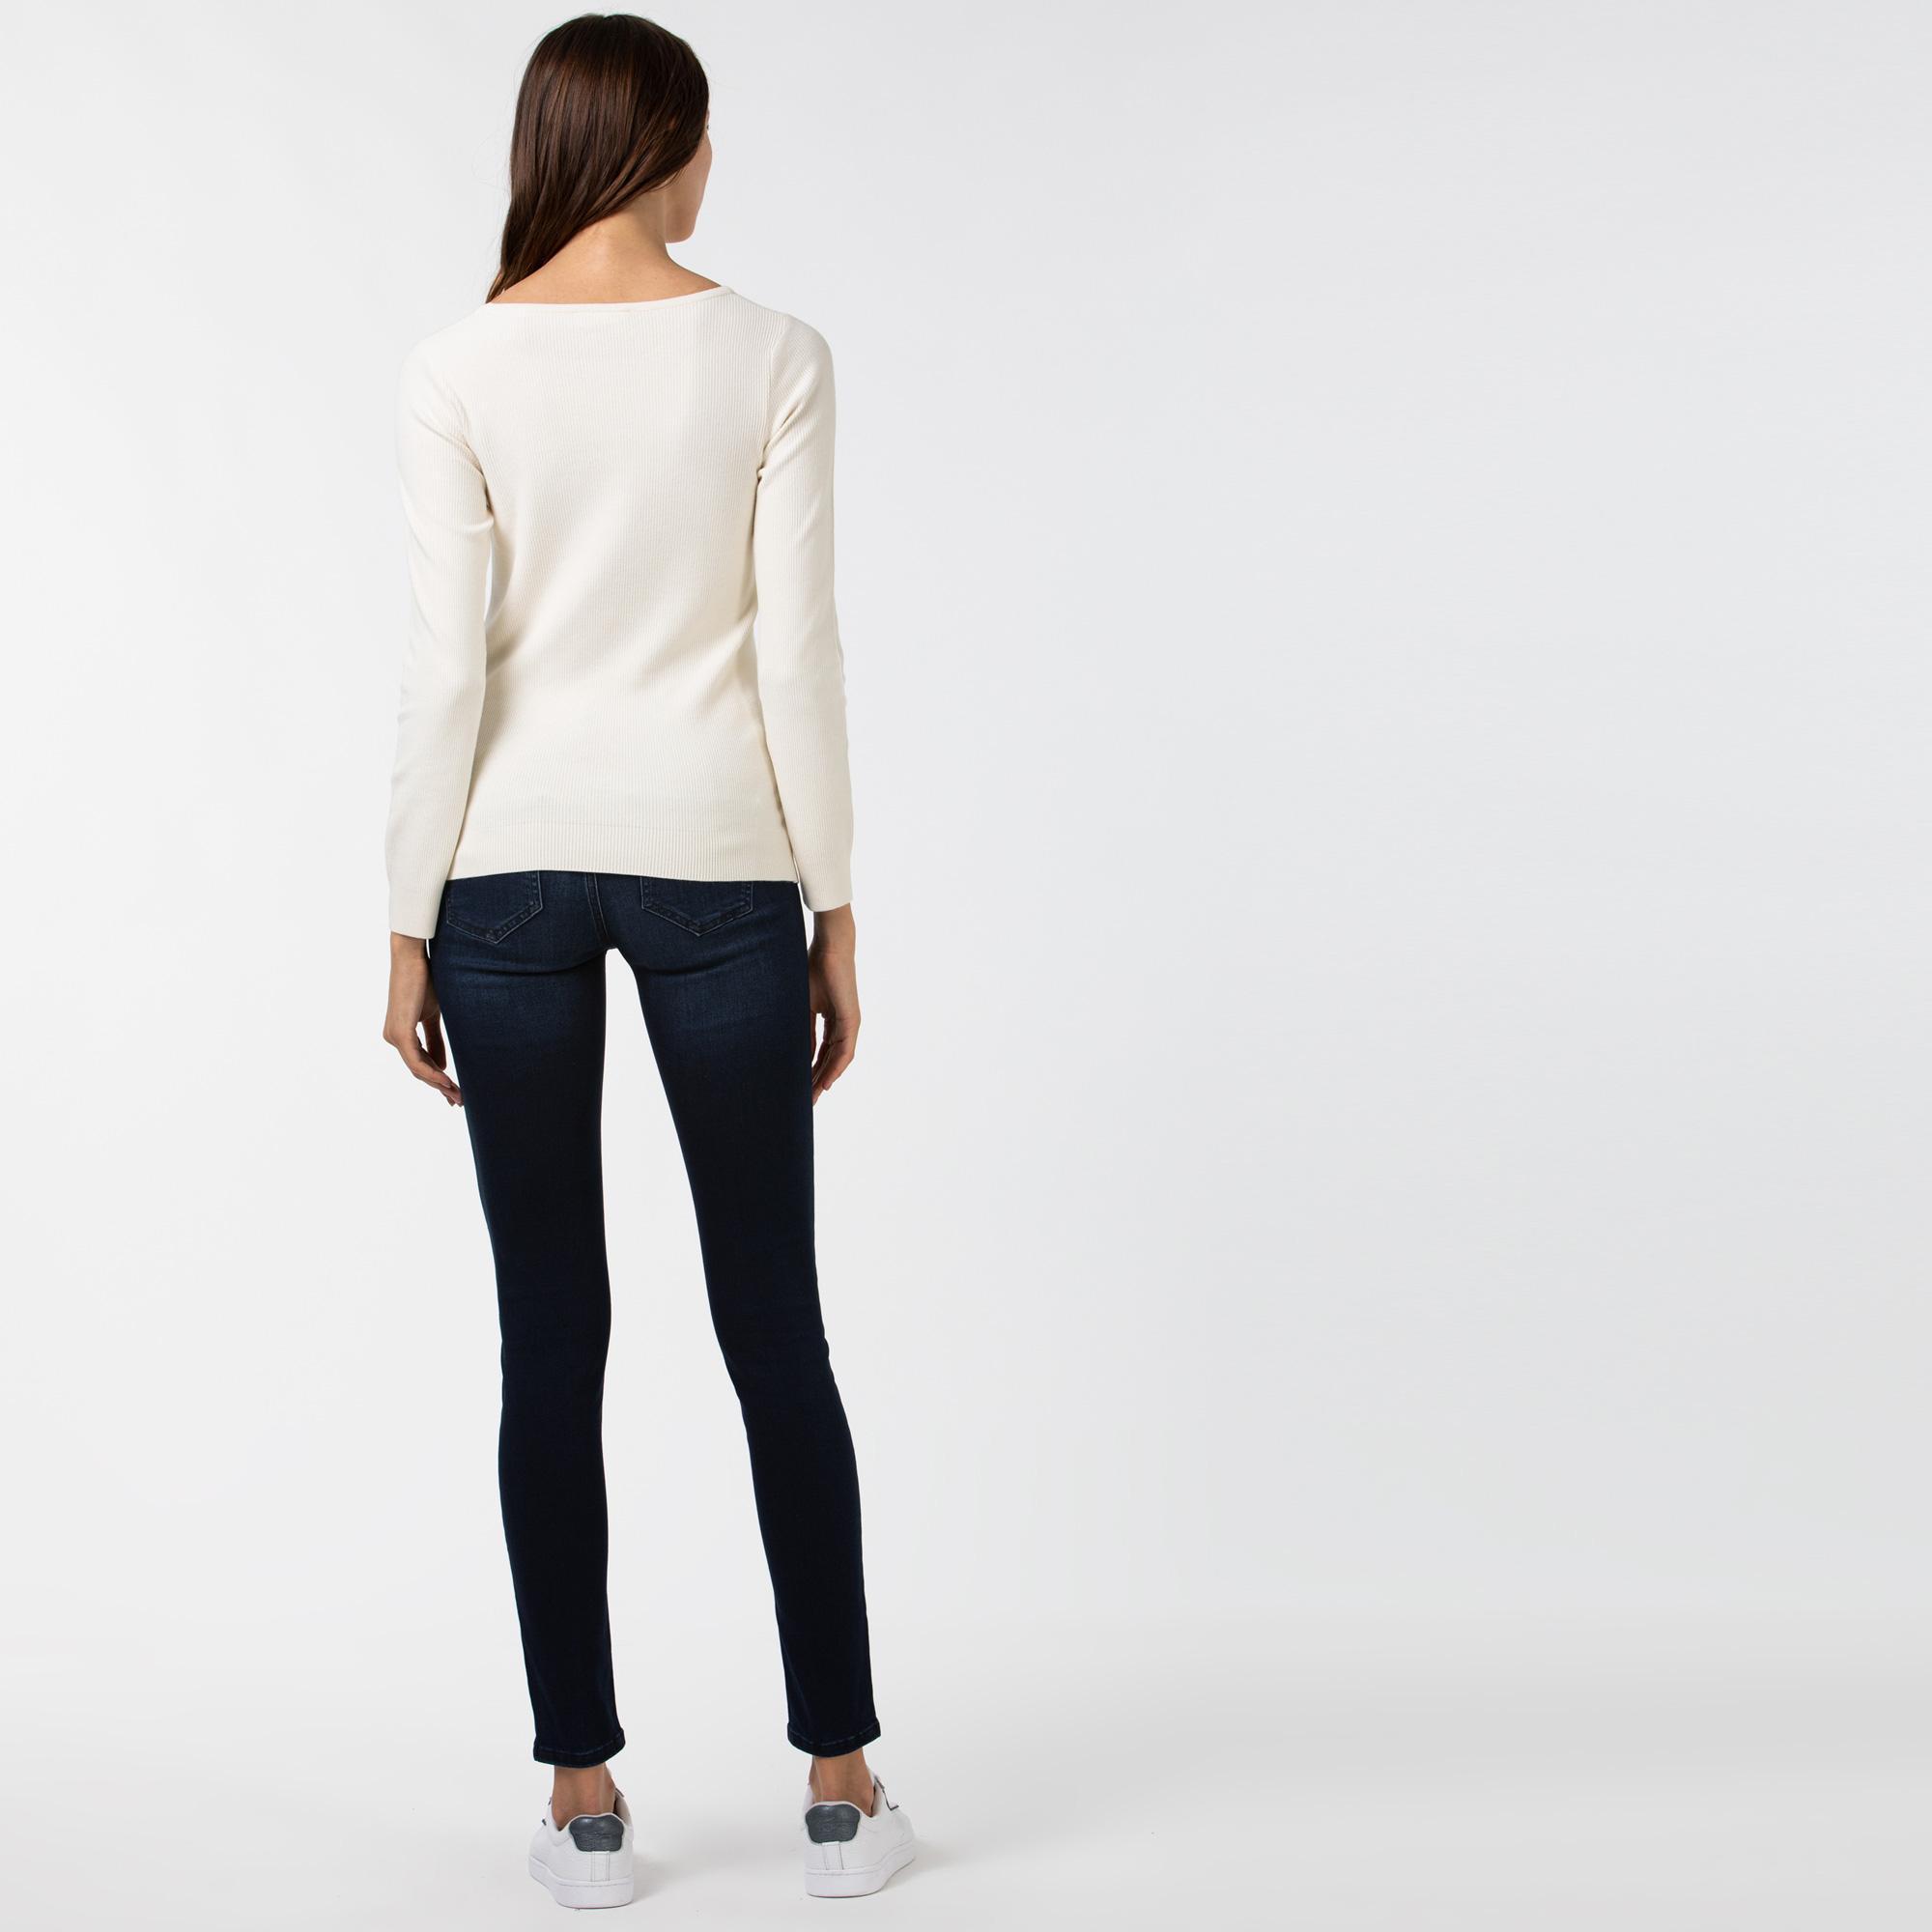 Lacoste Kadın Slim Fit Denim Mavi Pantolon